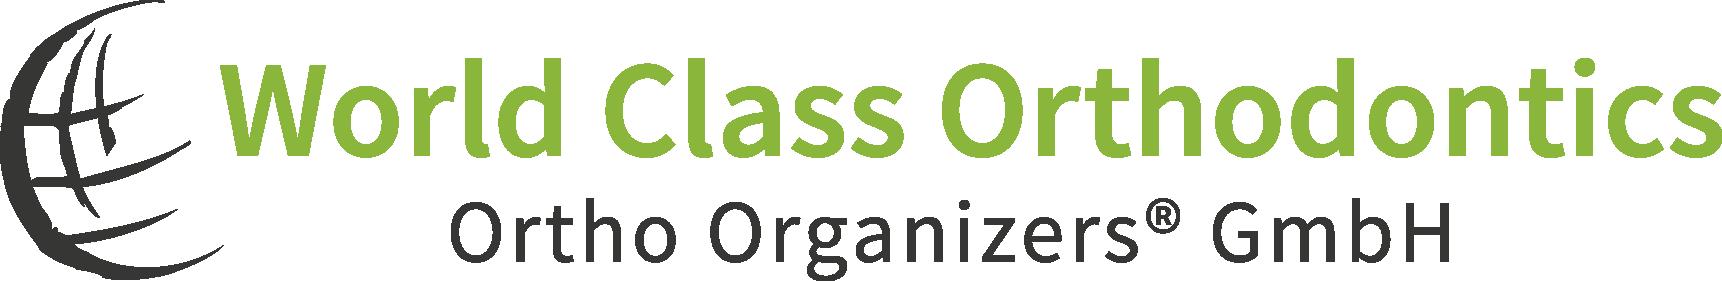 World Class Orthodontics – Ortho Organizers GmbH Logo